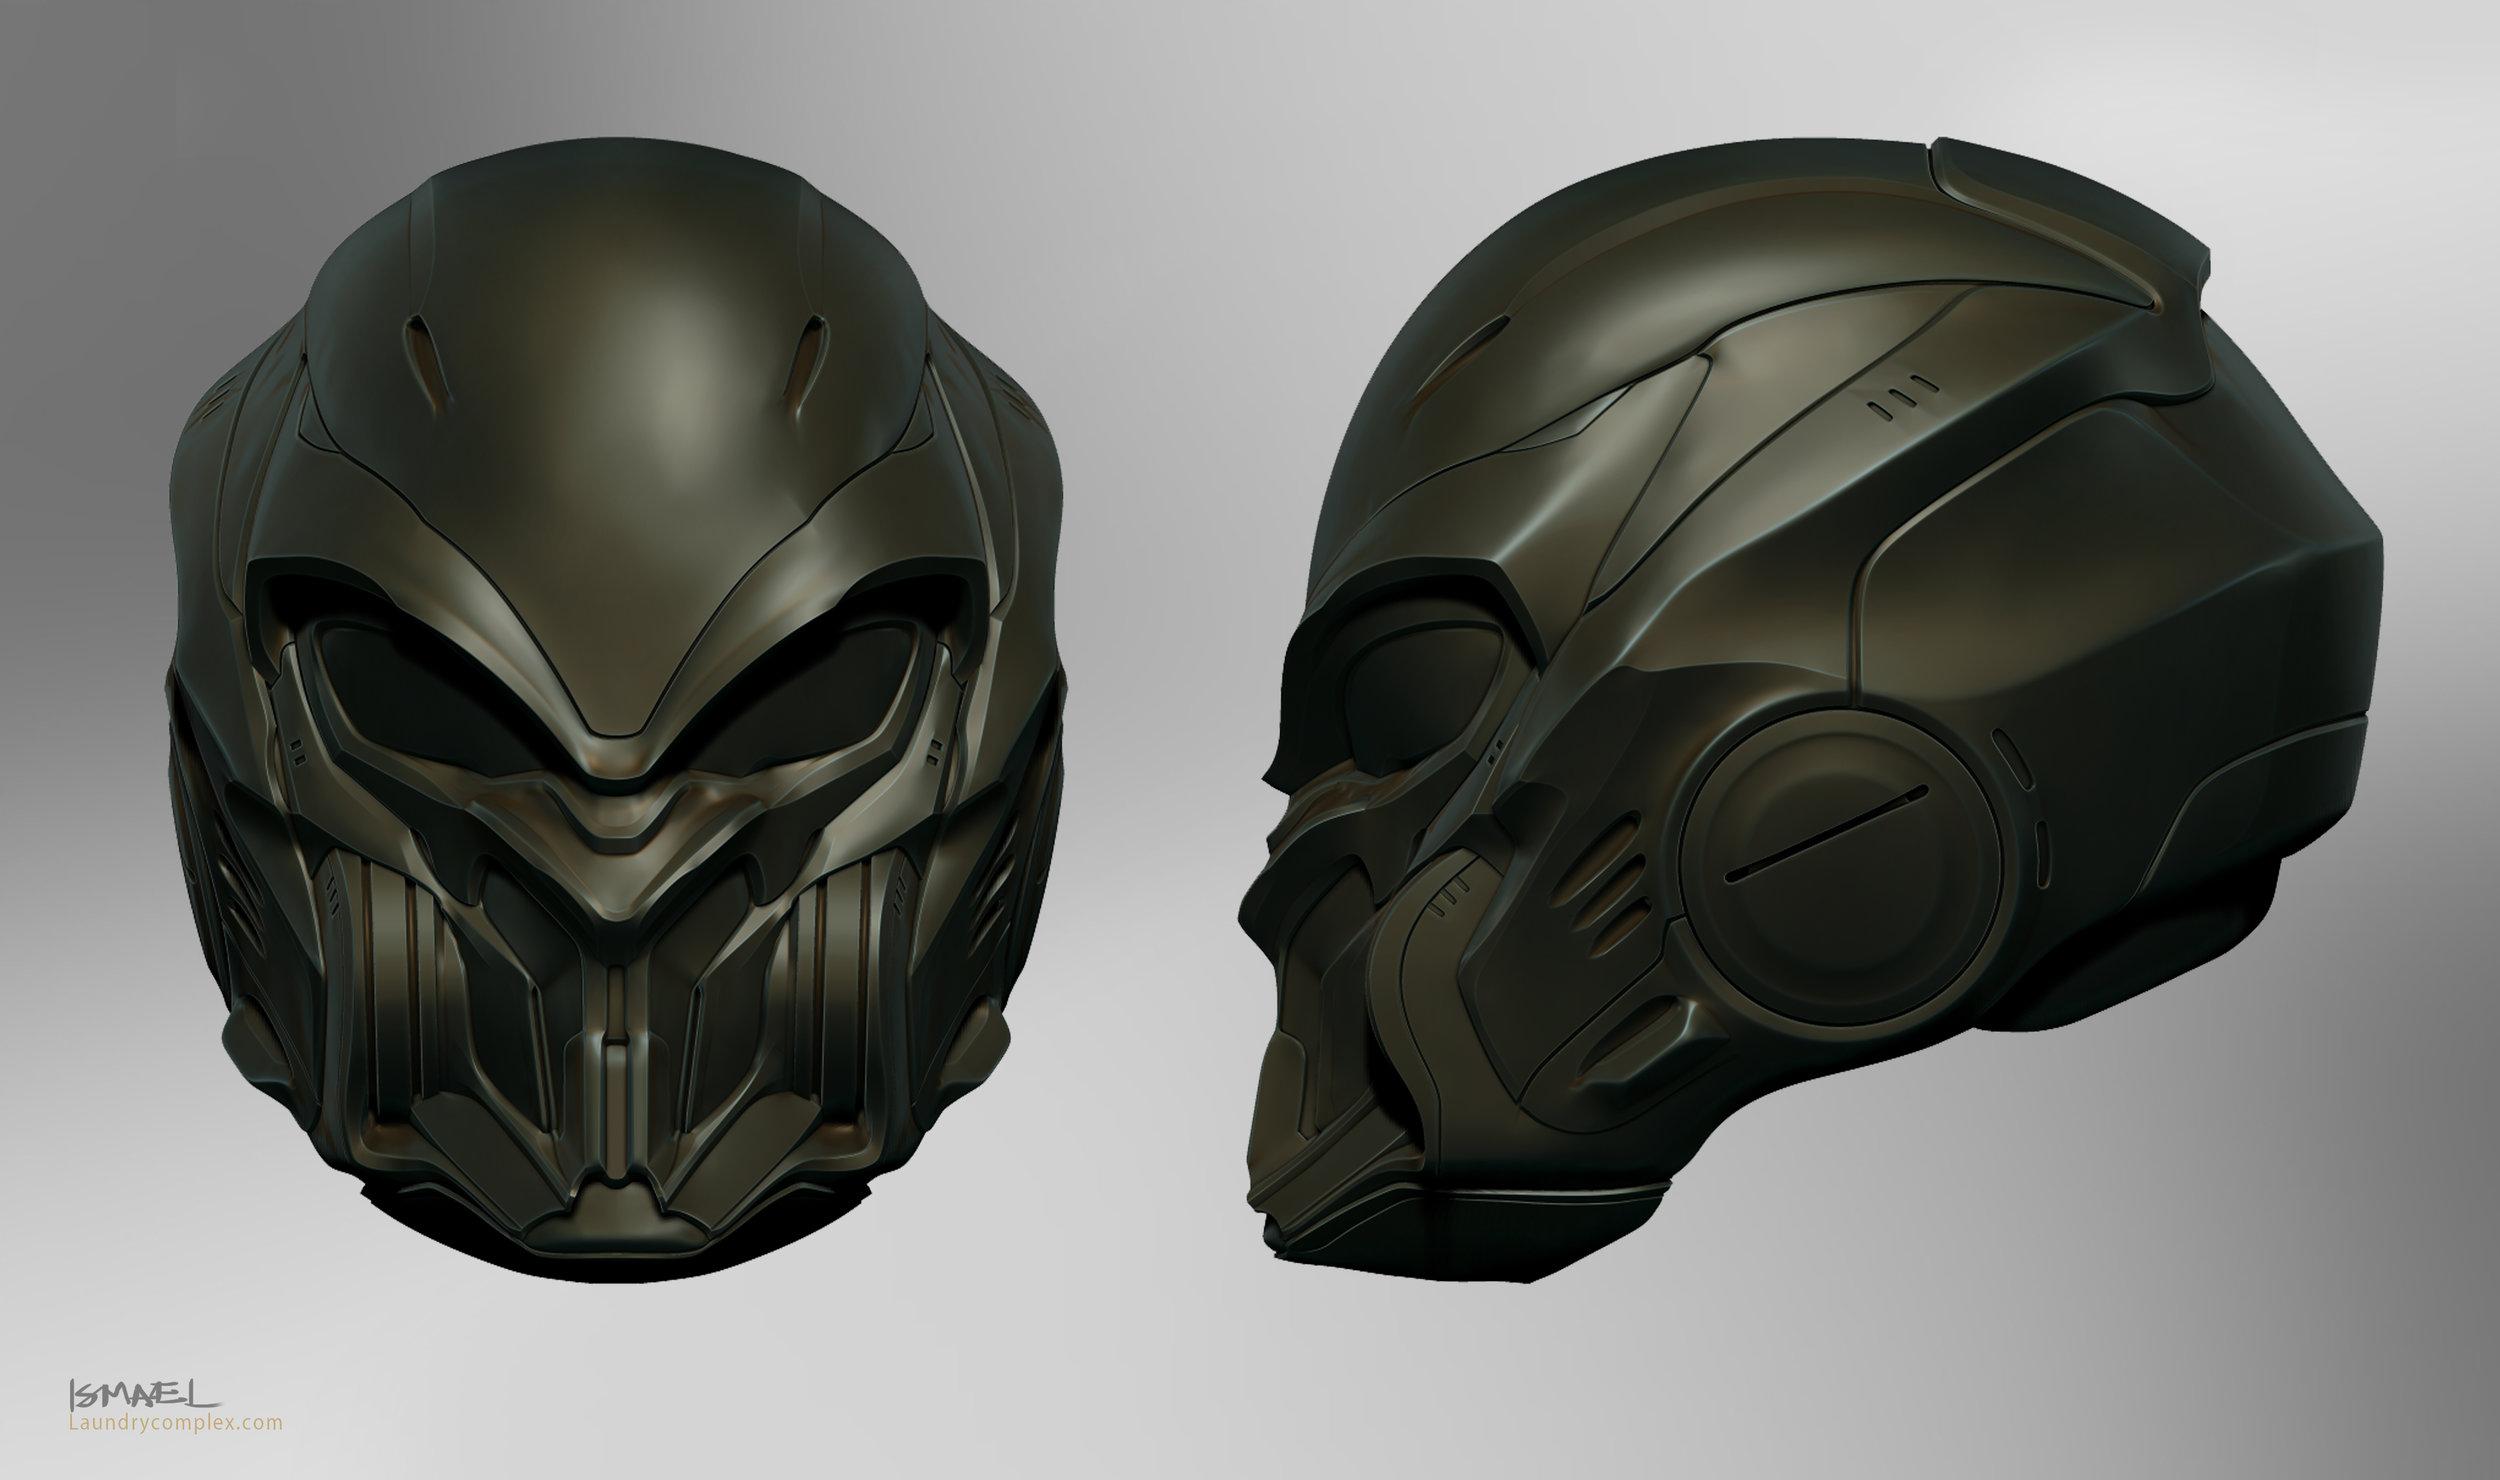 ISMAEL_Helmet_BEECH_Helmet_test_b_C70M.jpg